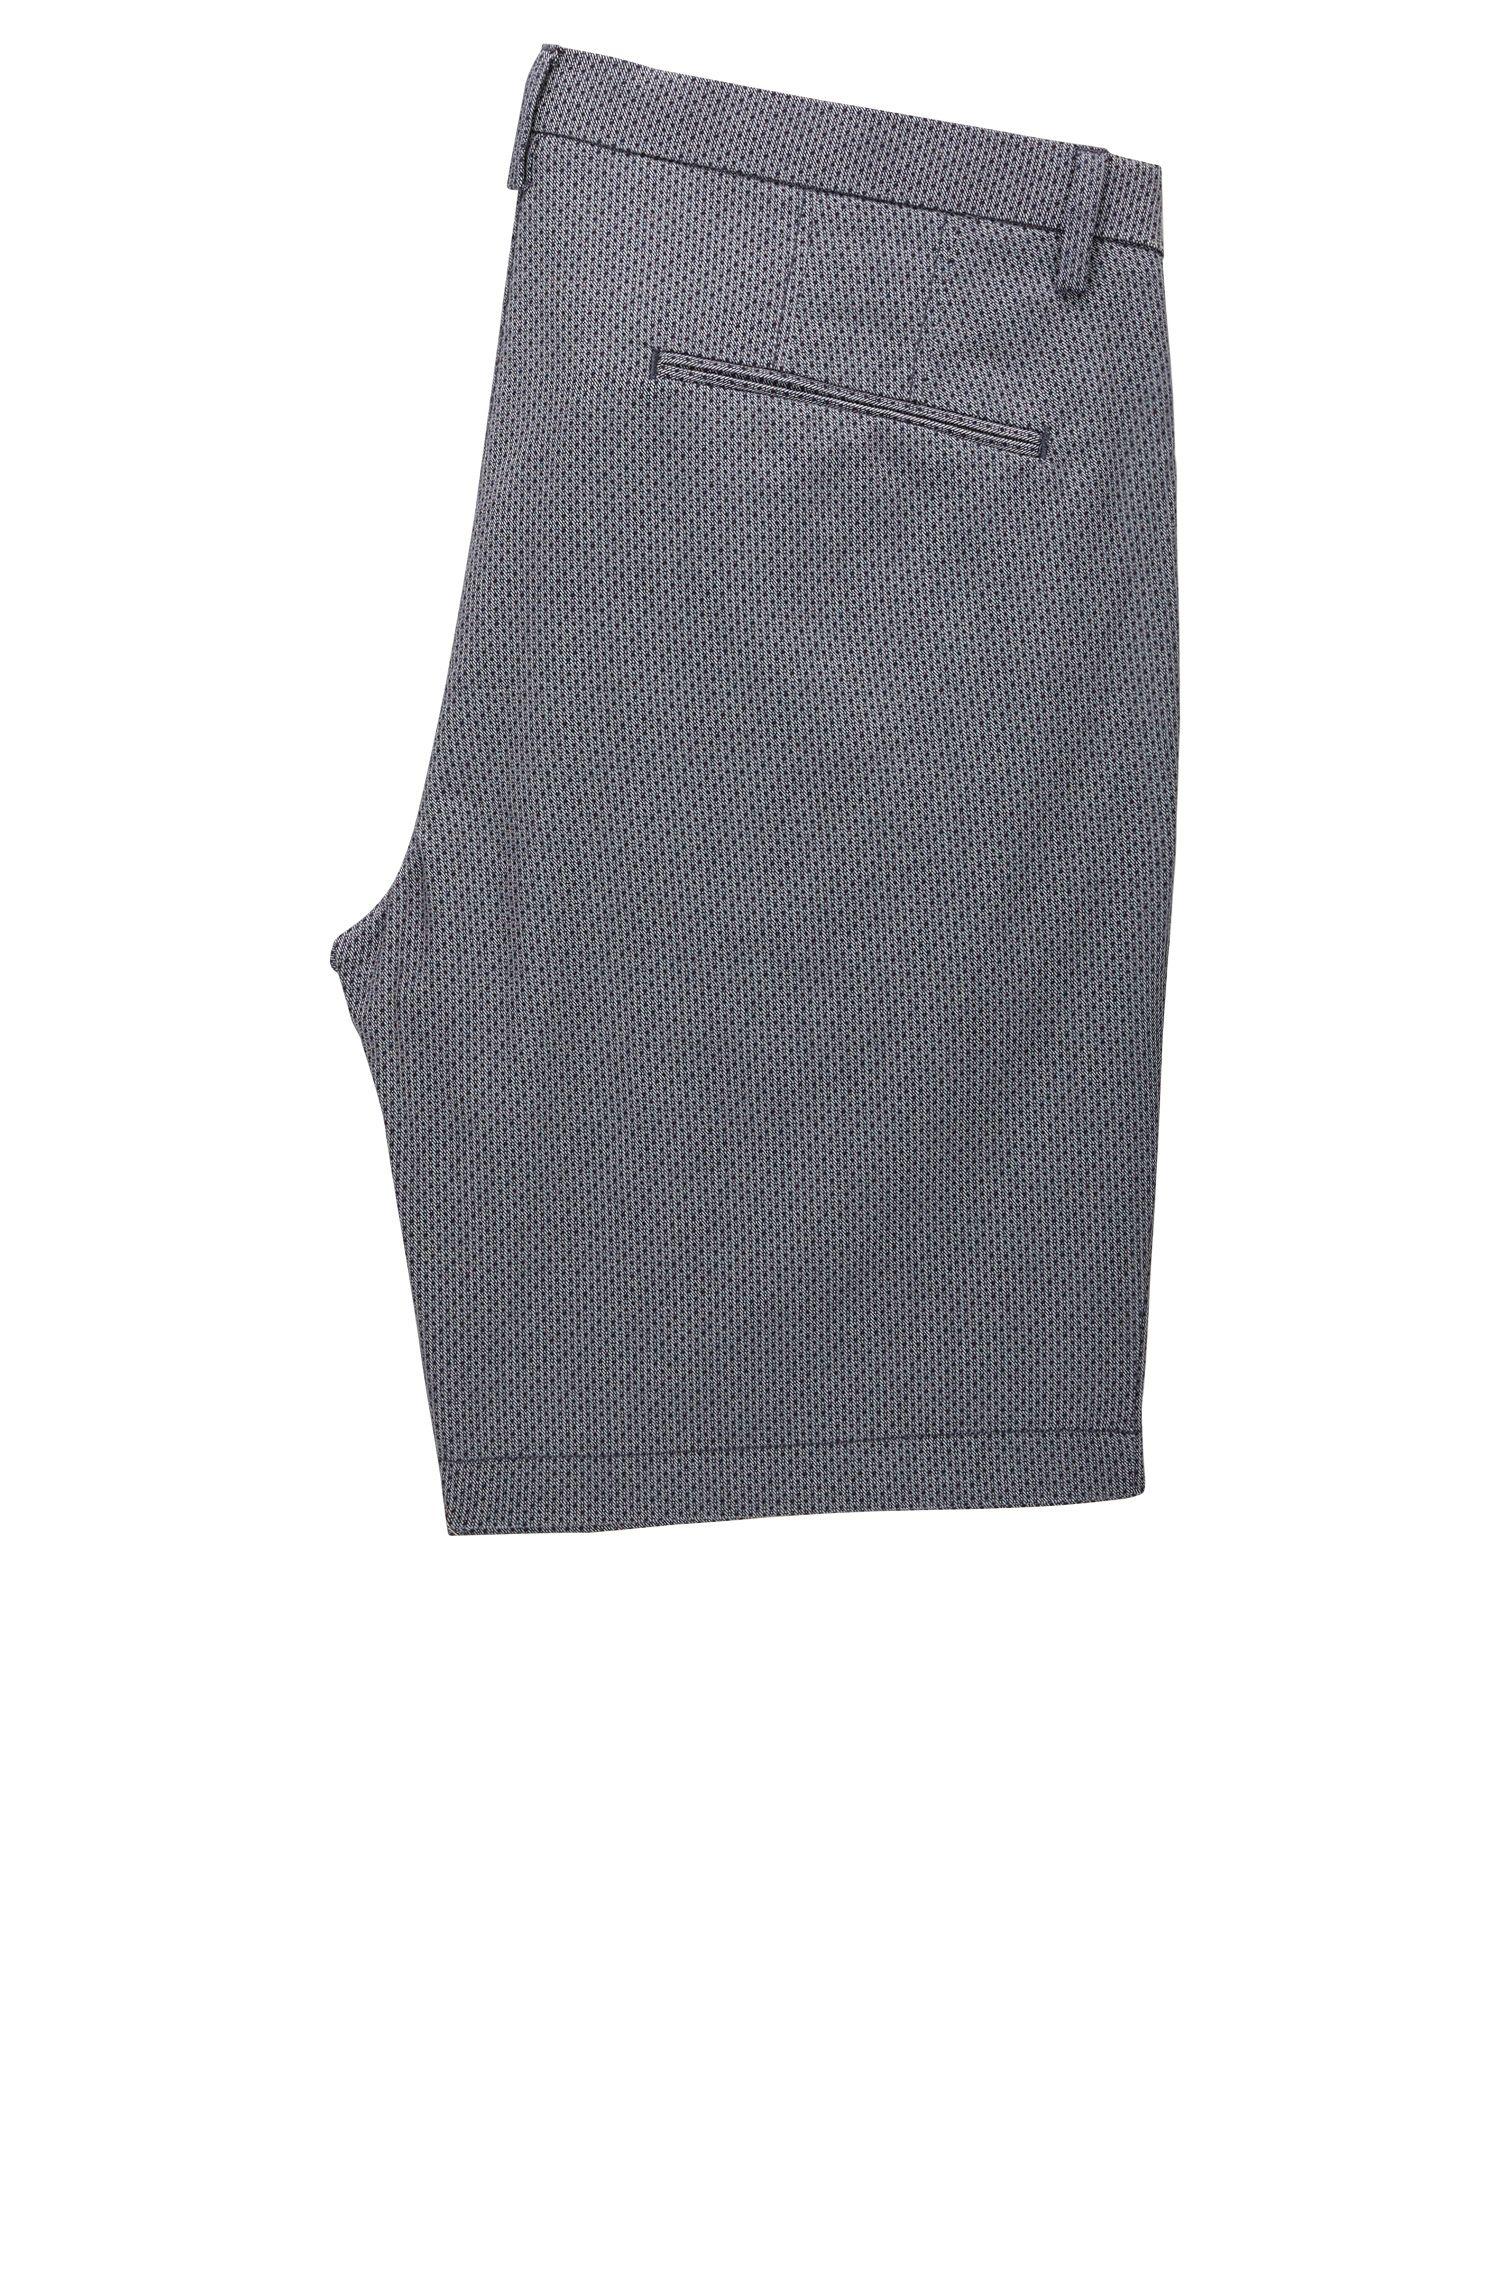 Stretch Cotton Printed Short, Slim Fit | Rice Short D, Dark Blue